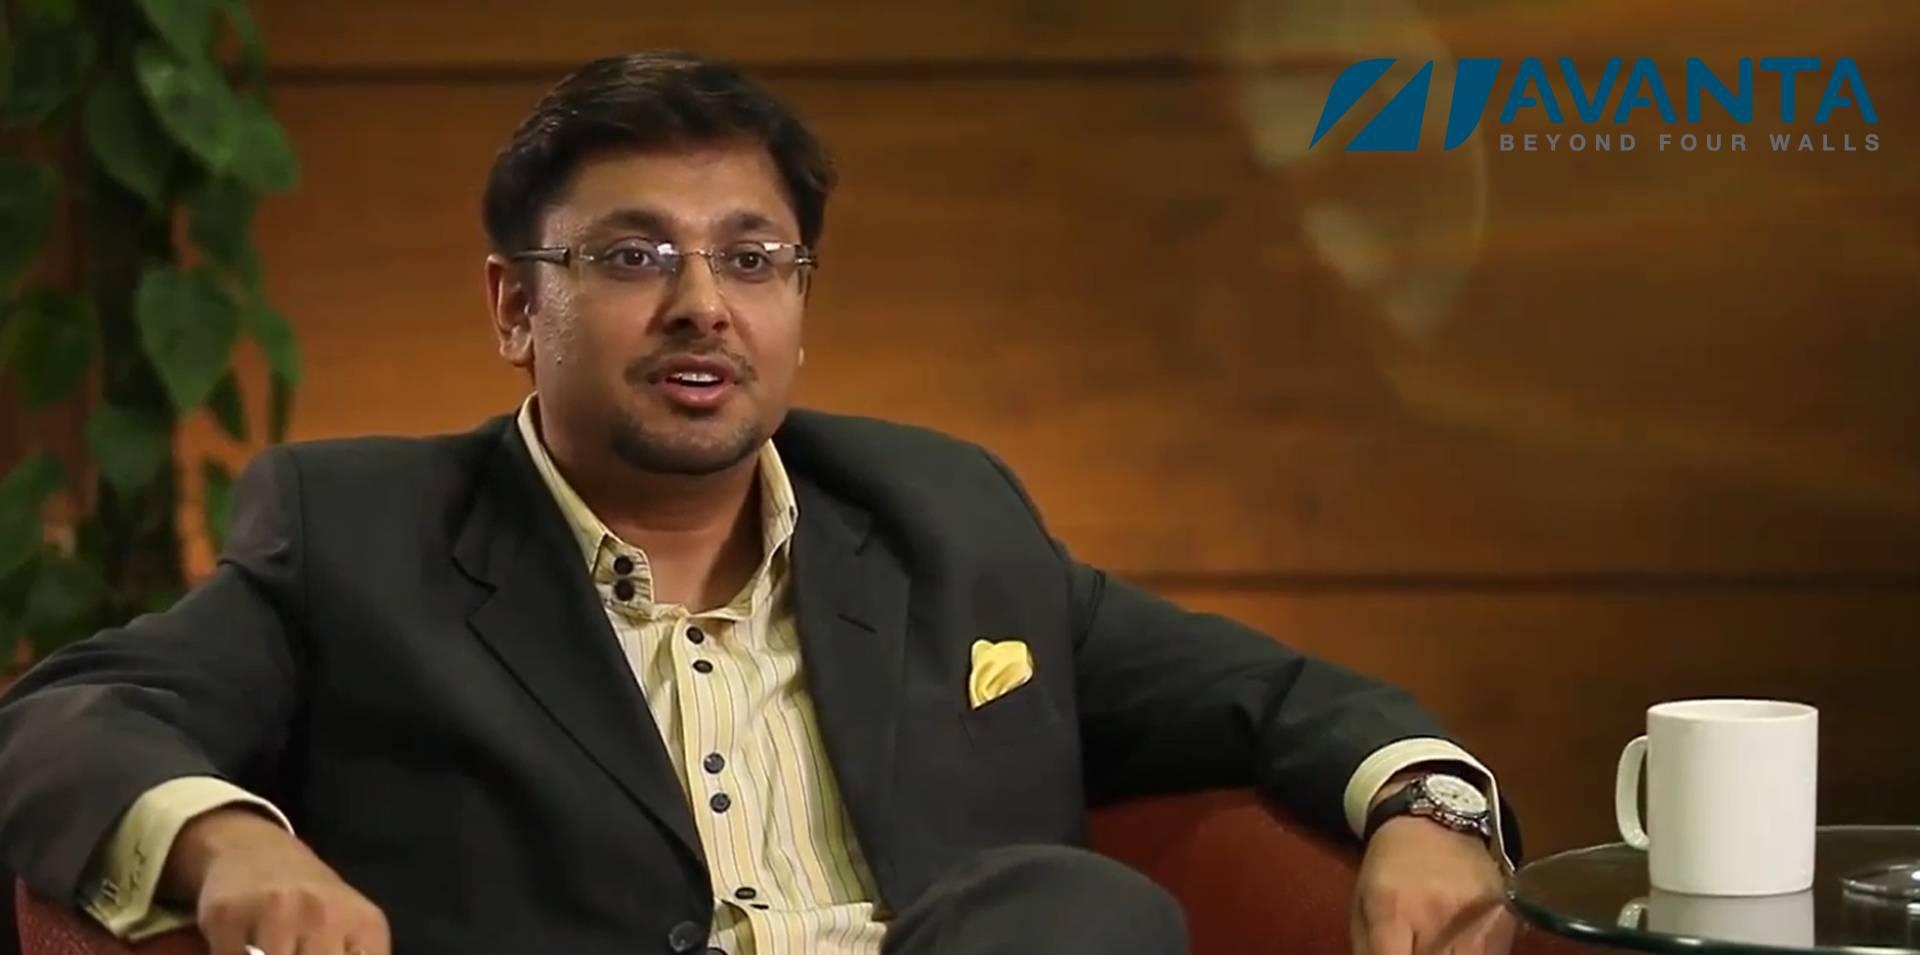 Avanta Business Centre Review by Premier Inn India Pvt. Ltd.